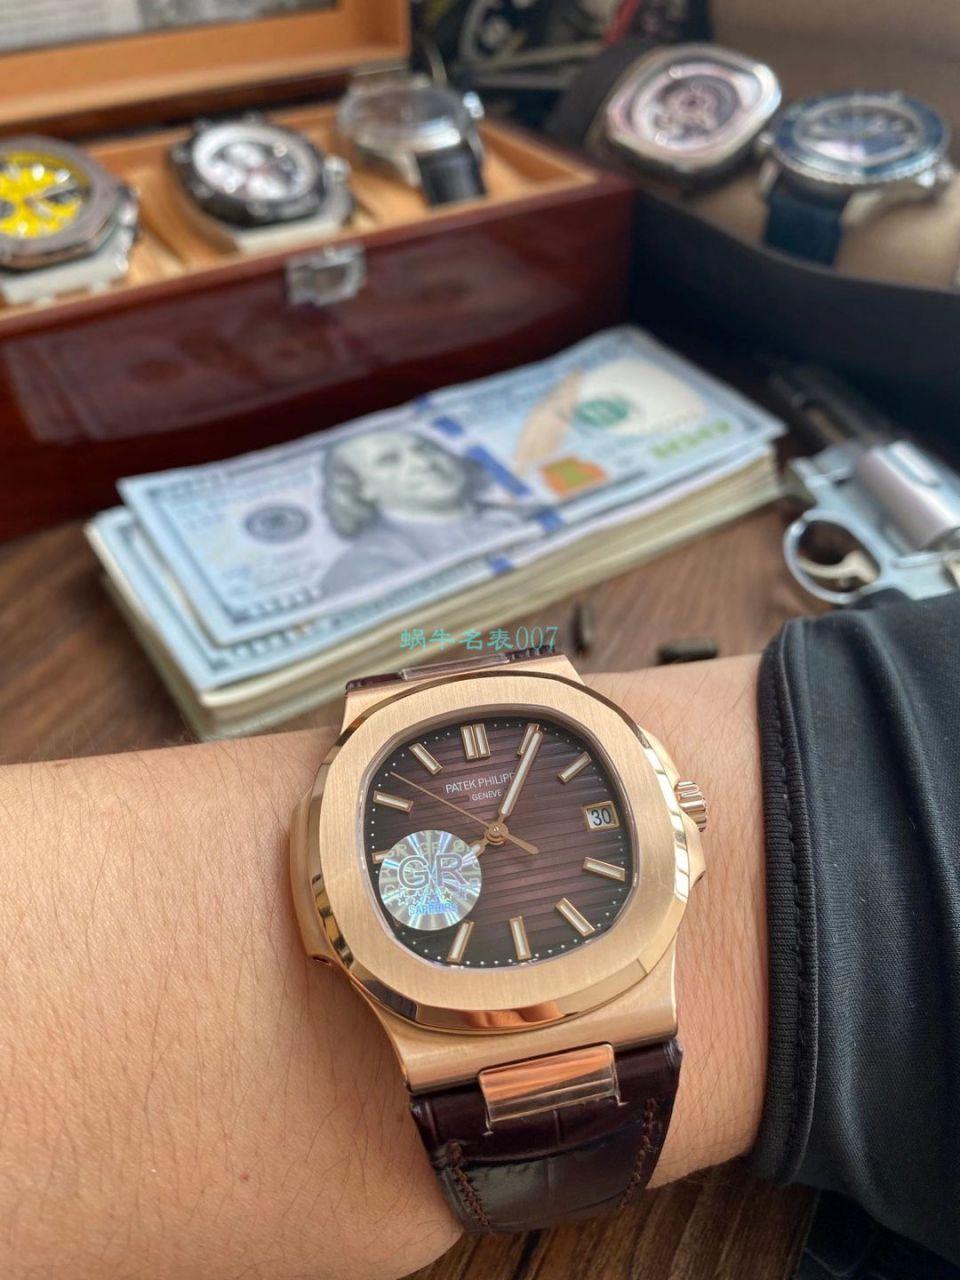 GR厂V2版本1比1超A复刻手表百达翡丽鹦鹉螺5711/1A-011腕表 / BD353